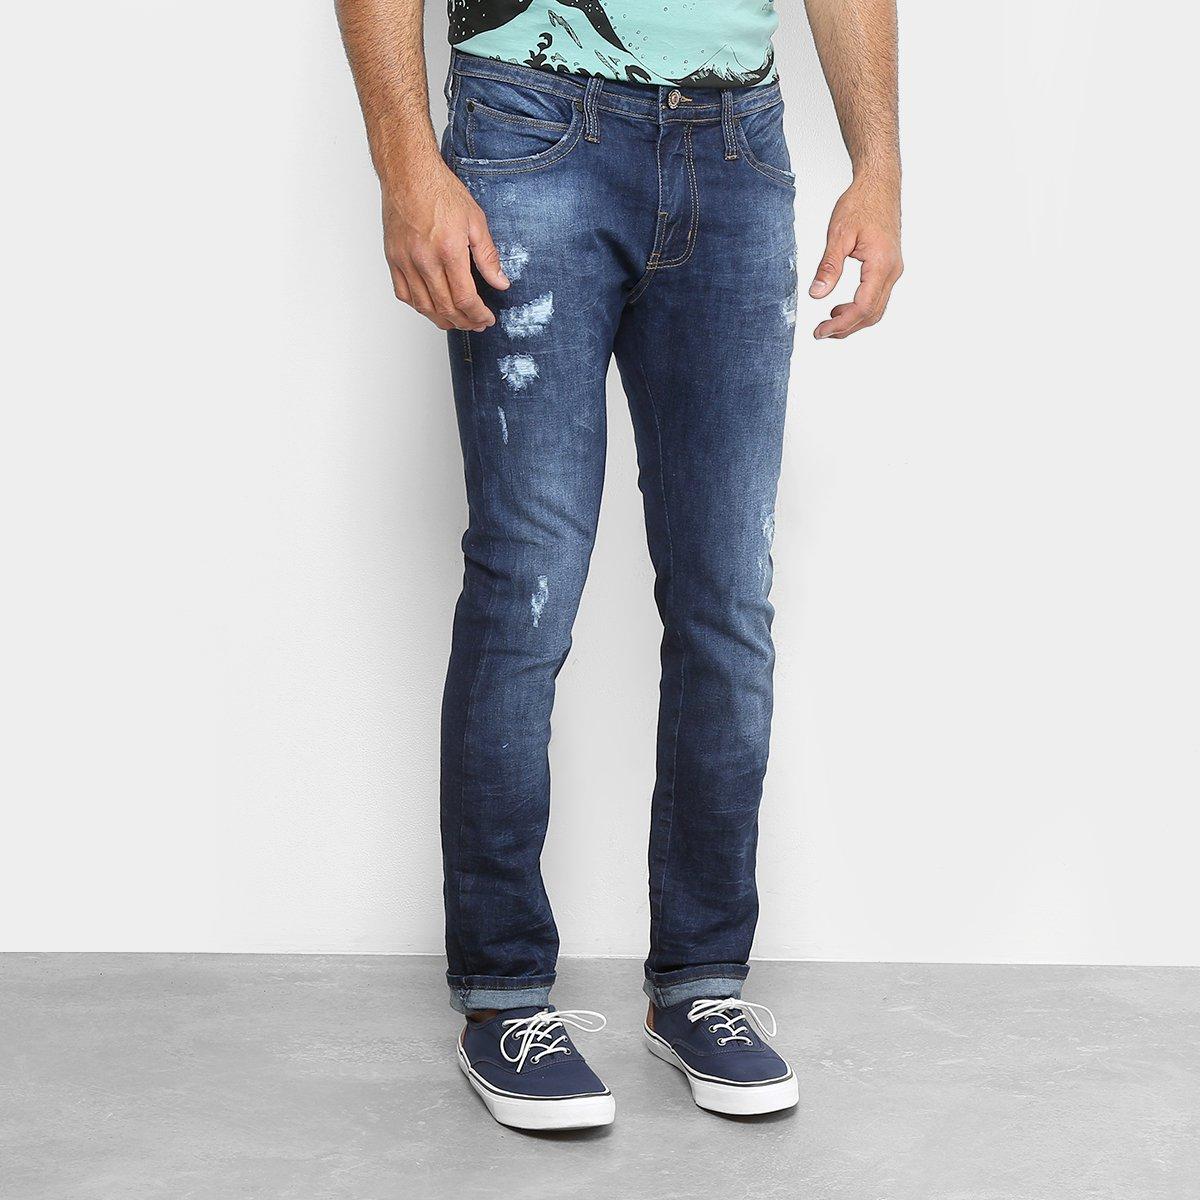 8eb9fae73 Calça Jeans Skinny Colcci Felipe Estonada Puídos Masculina | Livelo ...